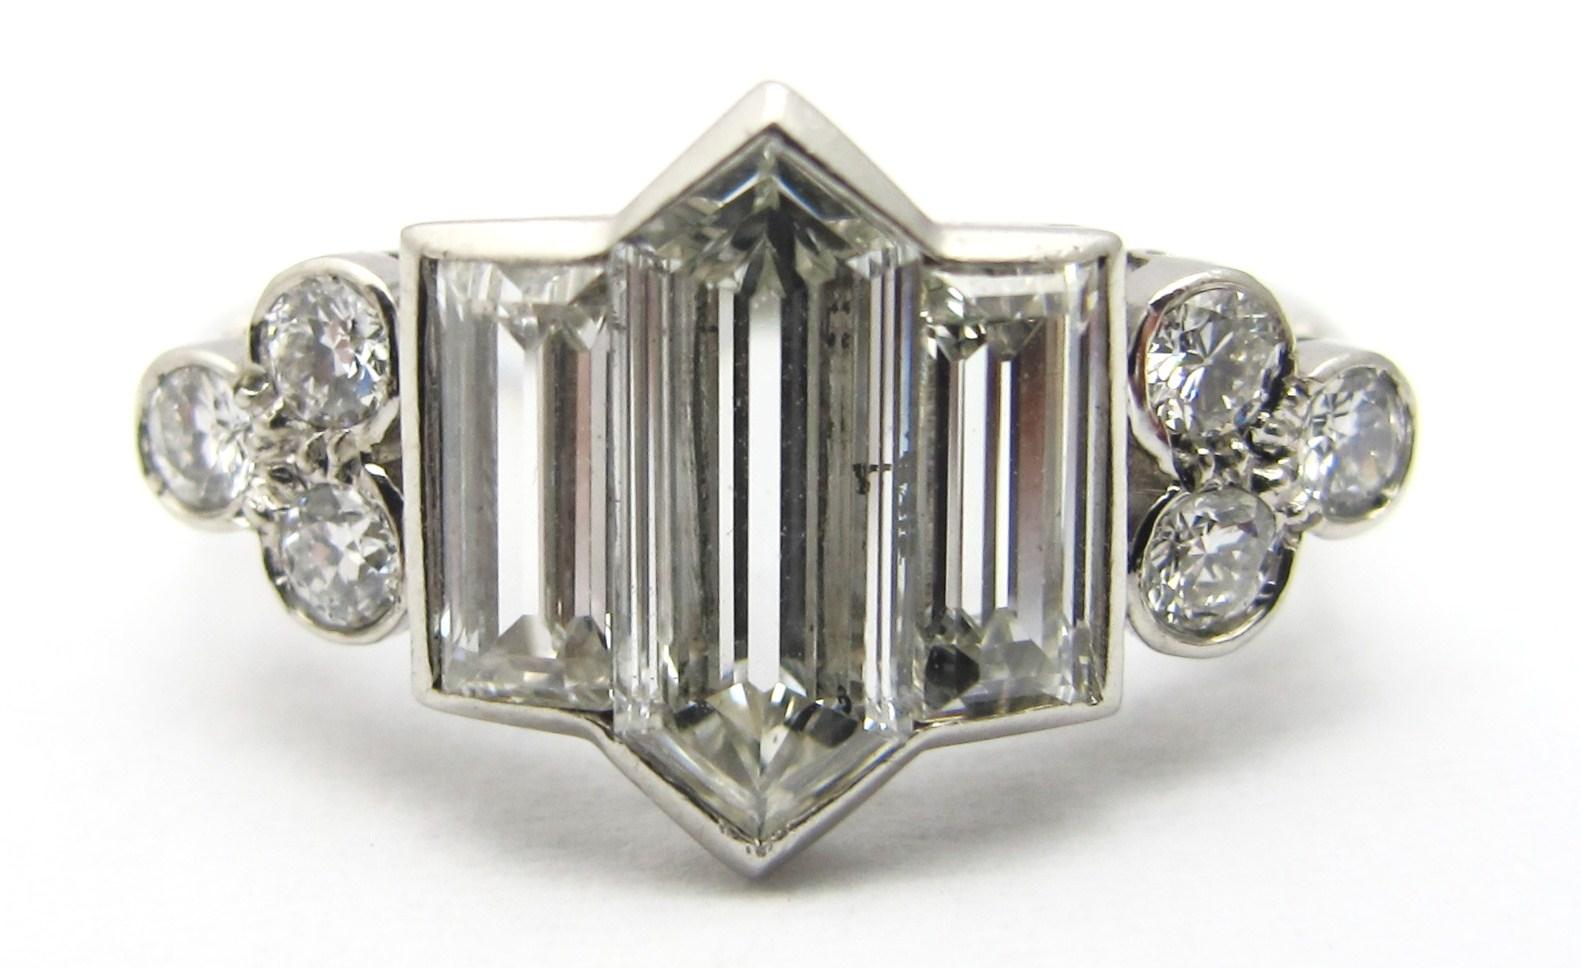 2.6cts of G/H, VS diamonds in handmade platinum setting, c.1935